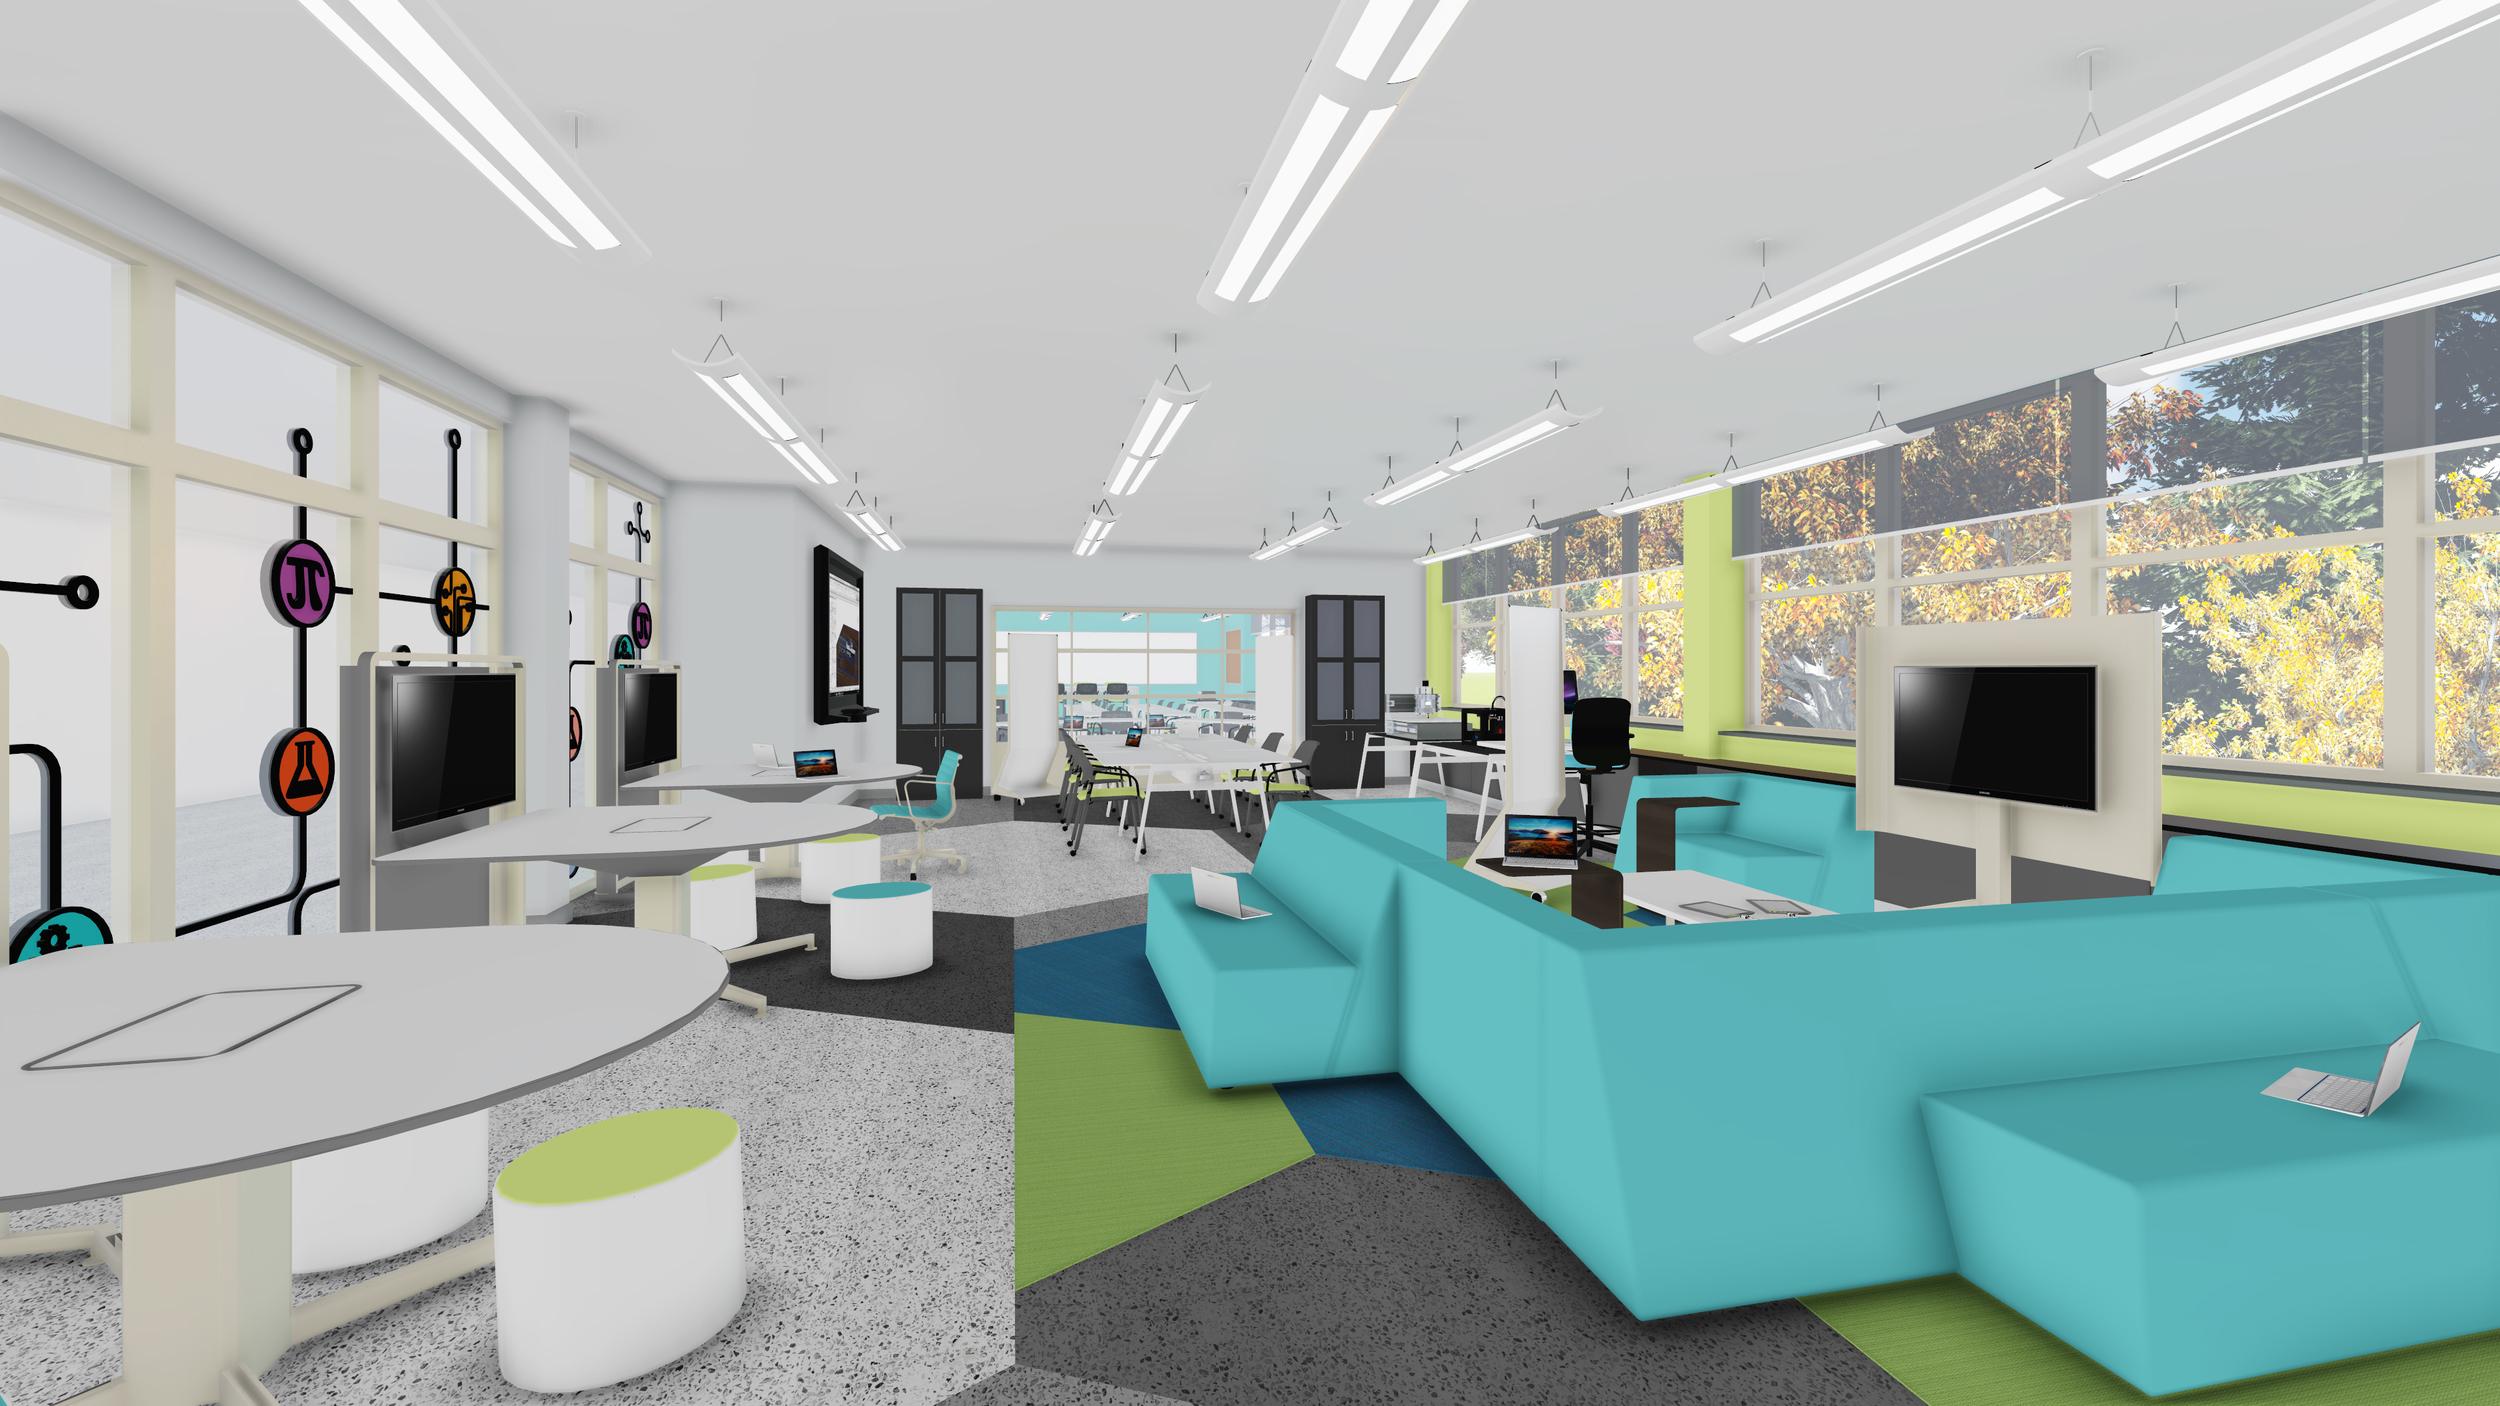 IN PROCESS: Innovation Lab Schematic Design